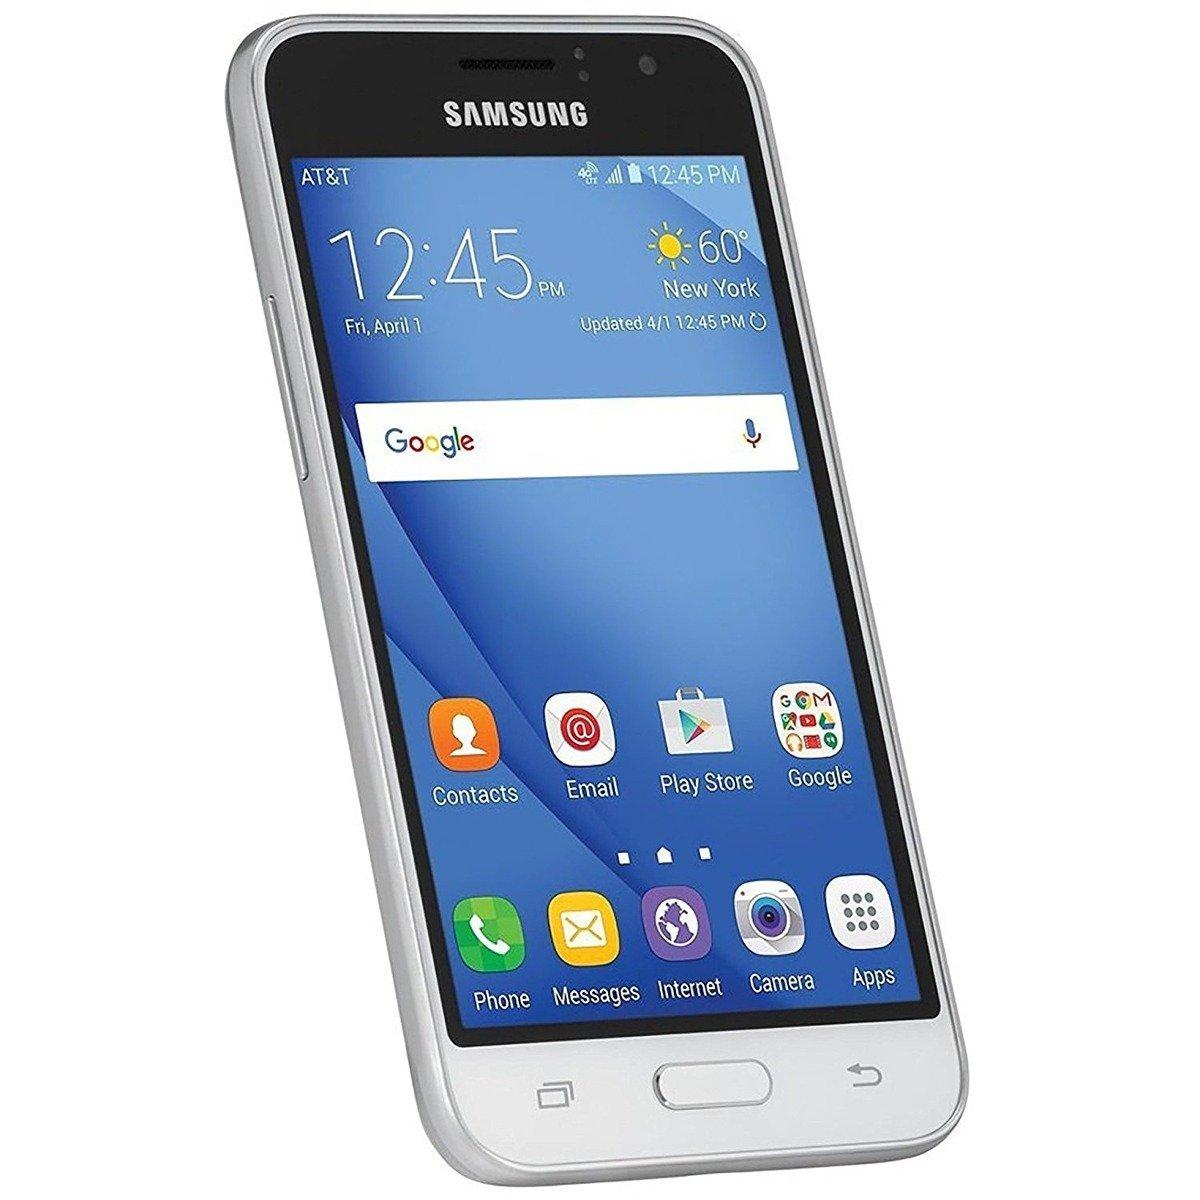 Samsung Express 3 J120a 4G LTE Unlocked GSM (White) by Samsung